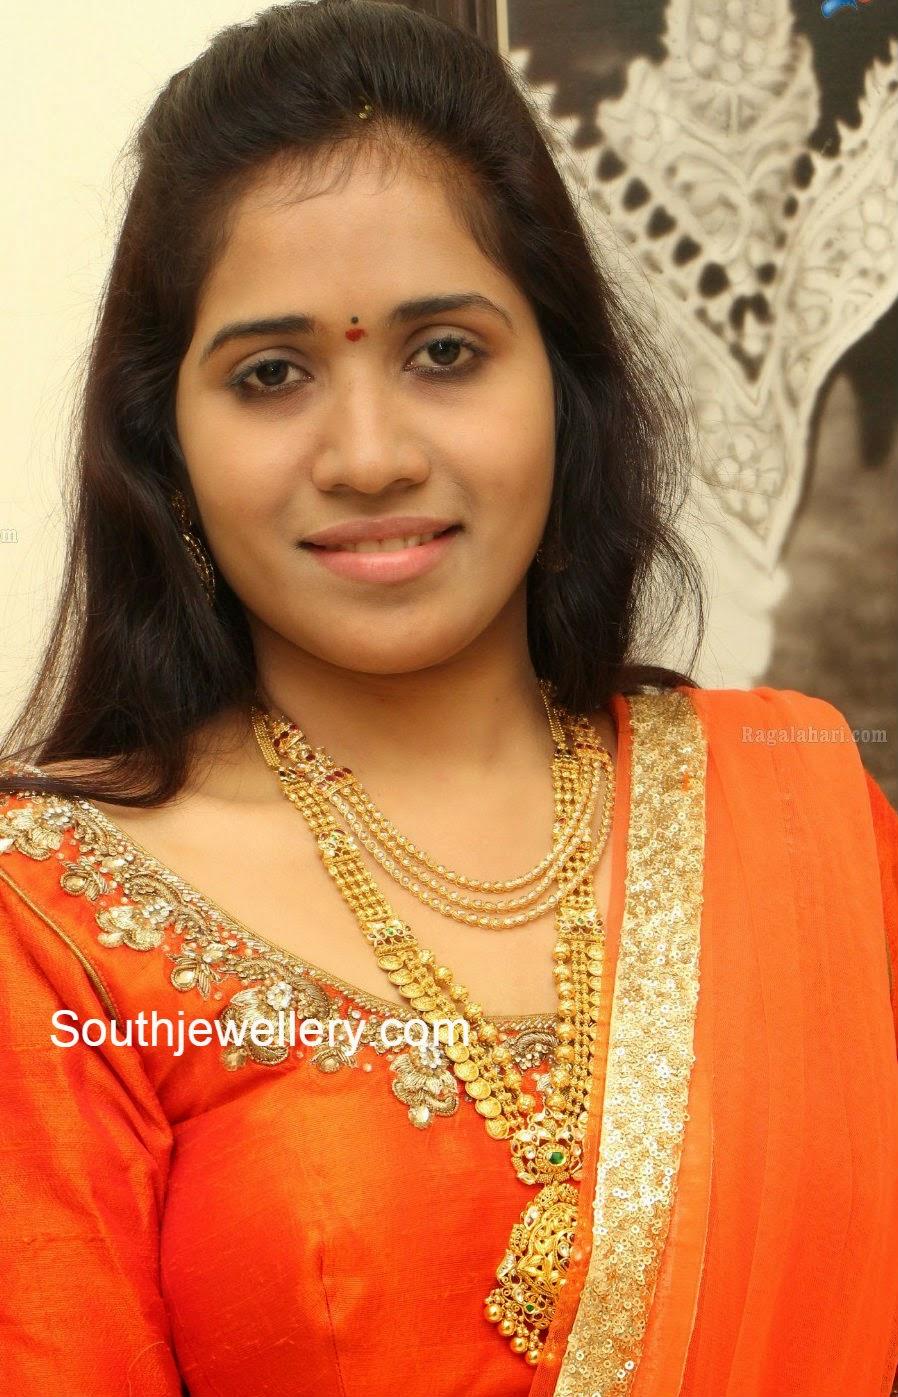 Suhasini in gundla haram jewellery designs - Bride In Uncut Necklace And Kasu Haram